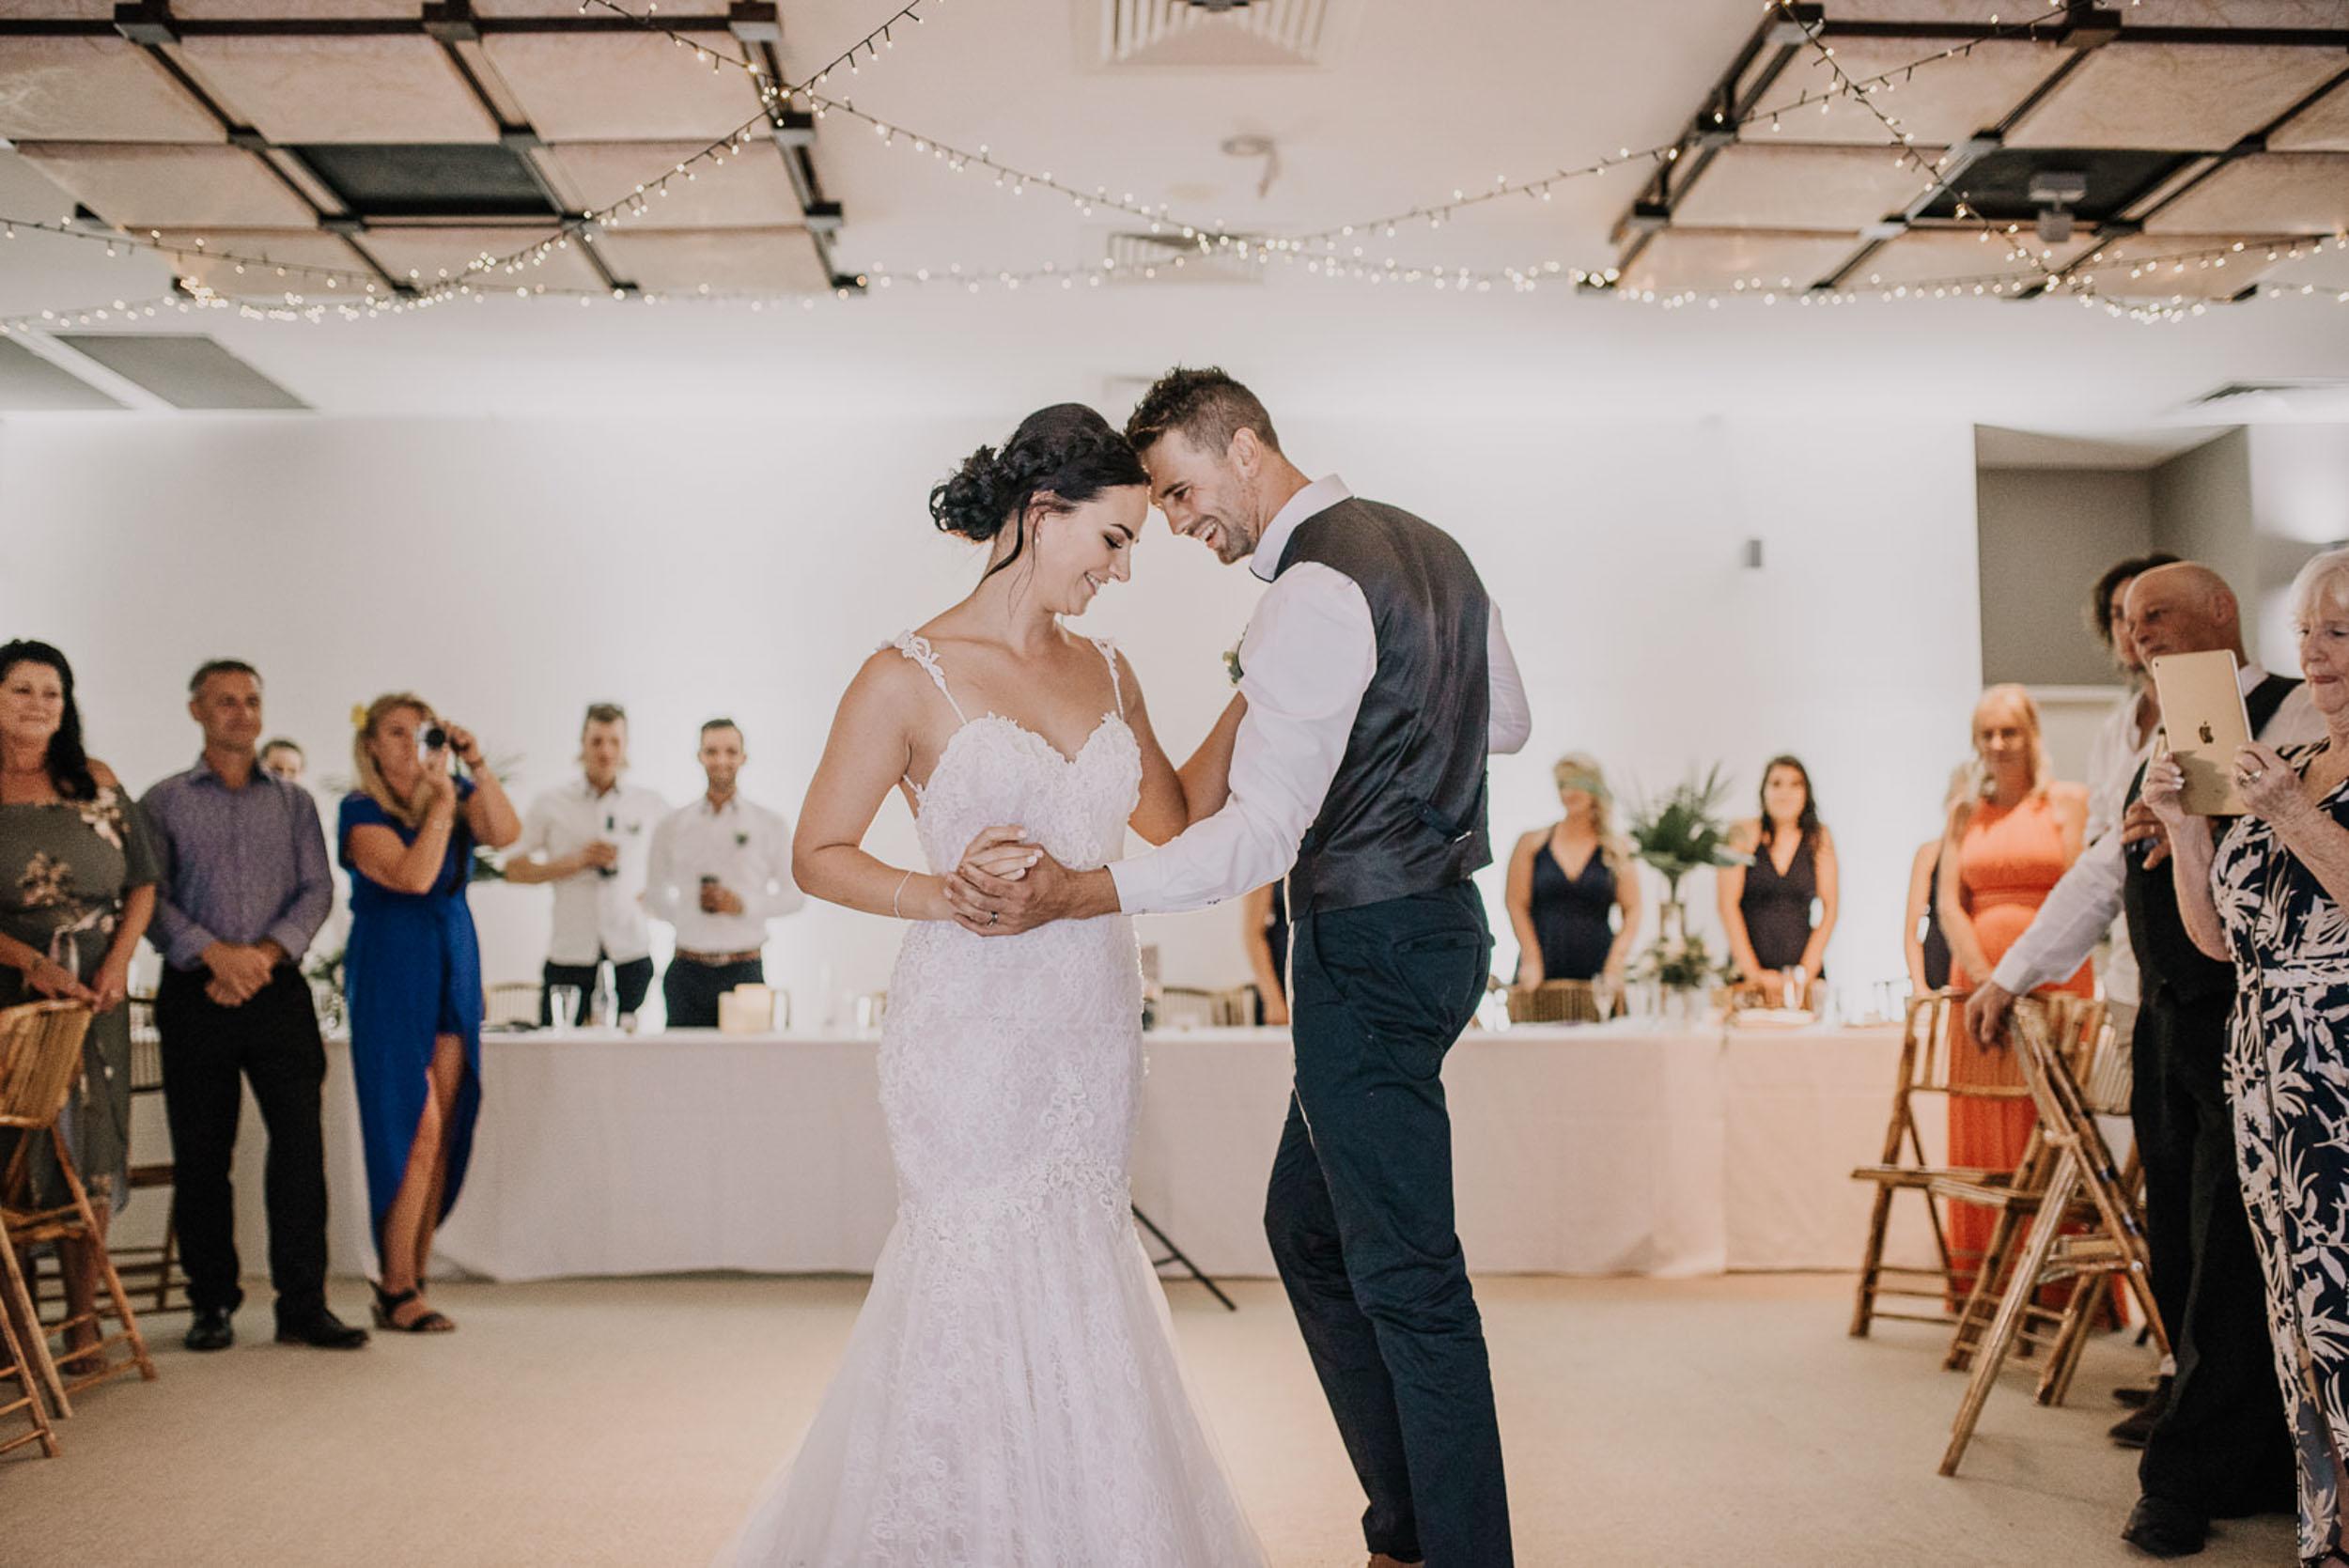 The Raw Photographer - Cairns Wedding Photographer - Fitzroy Island - Destination Wedding - Bride Dress - Groom Portrait - Queensland-47.jpg